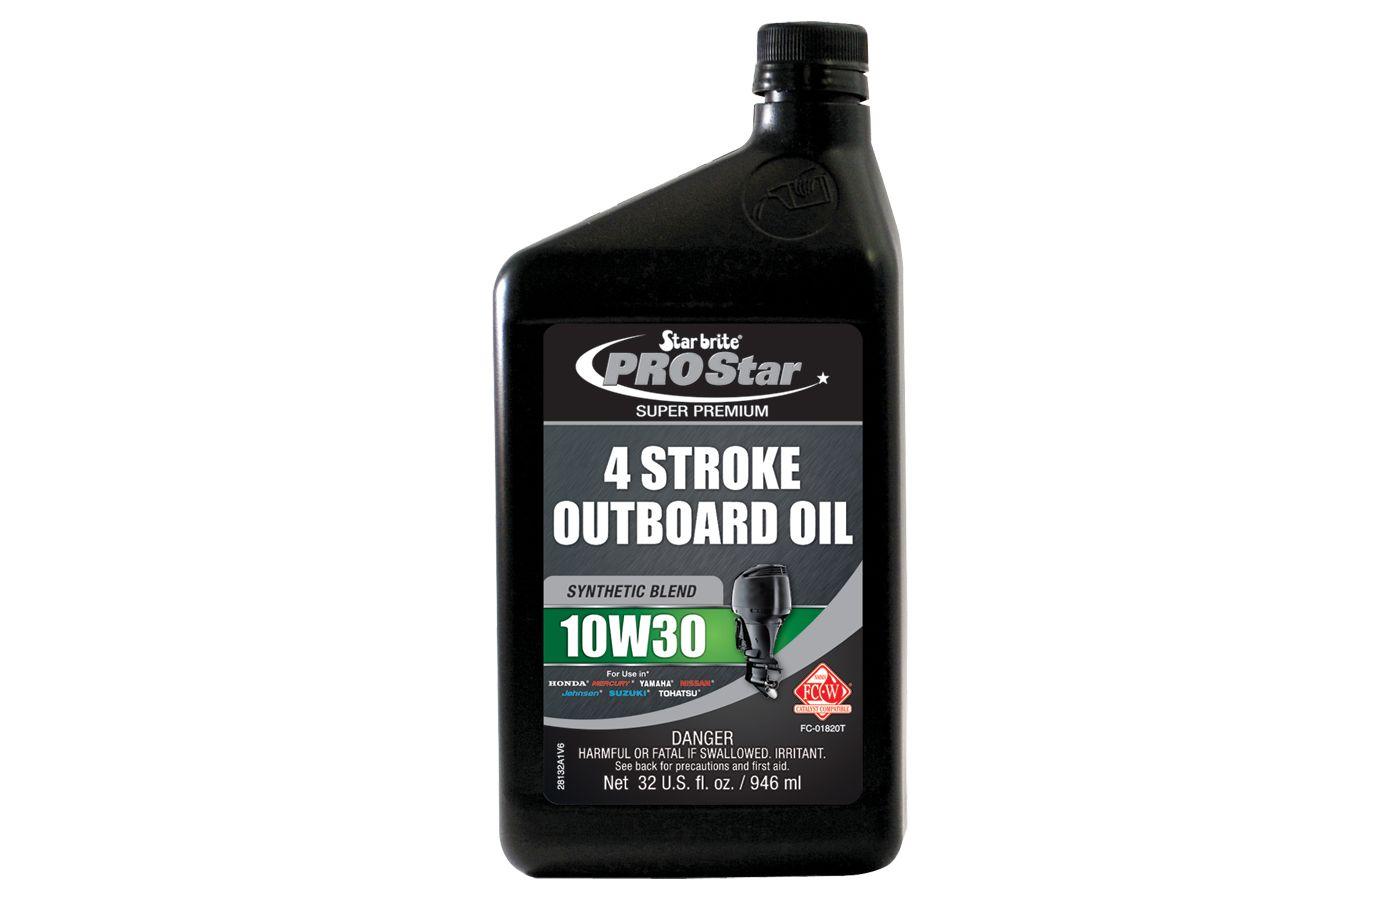 Star brite Premium Synthetic Blend 4 Stroke Oil – 32 oz.